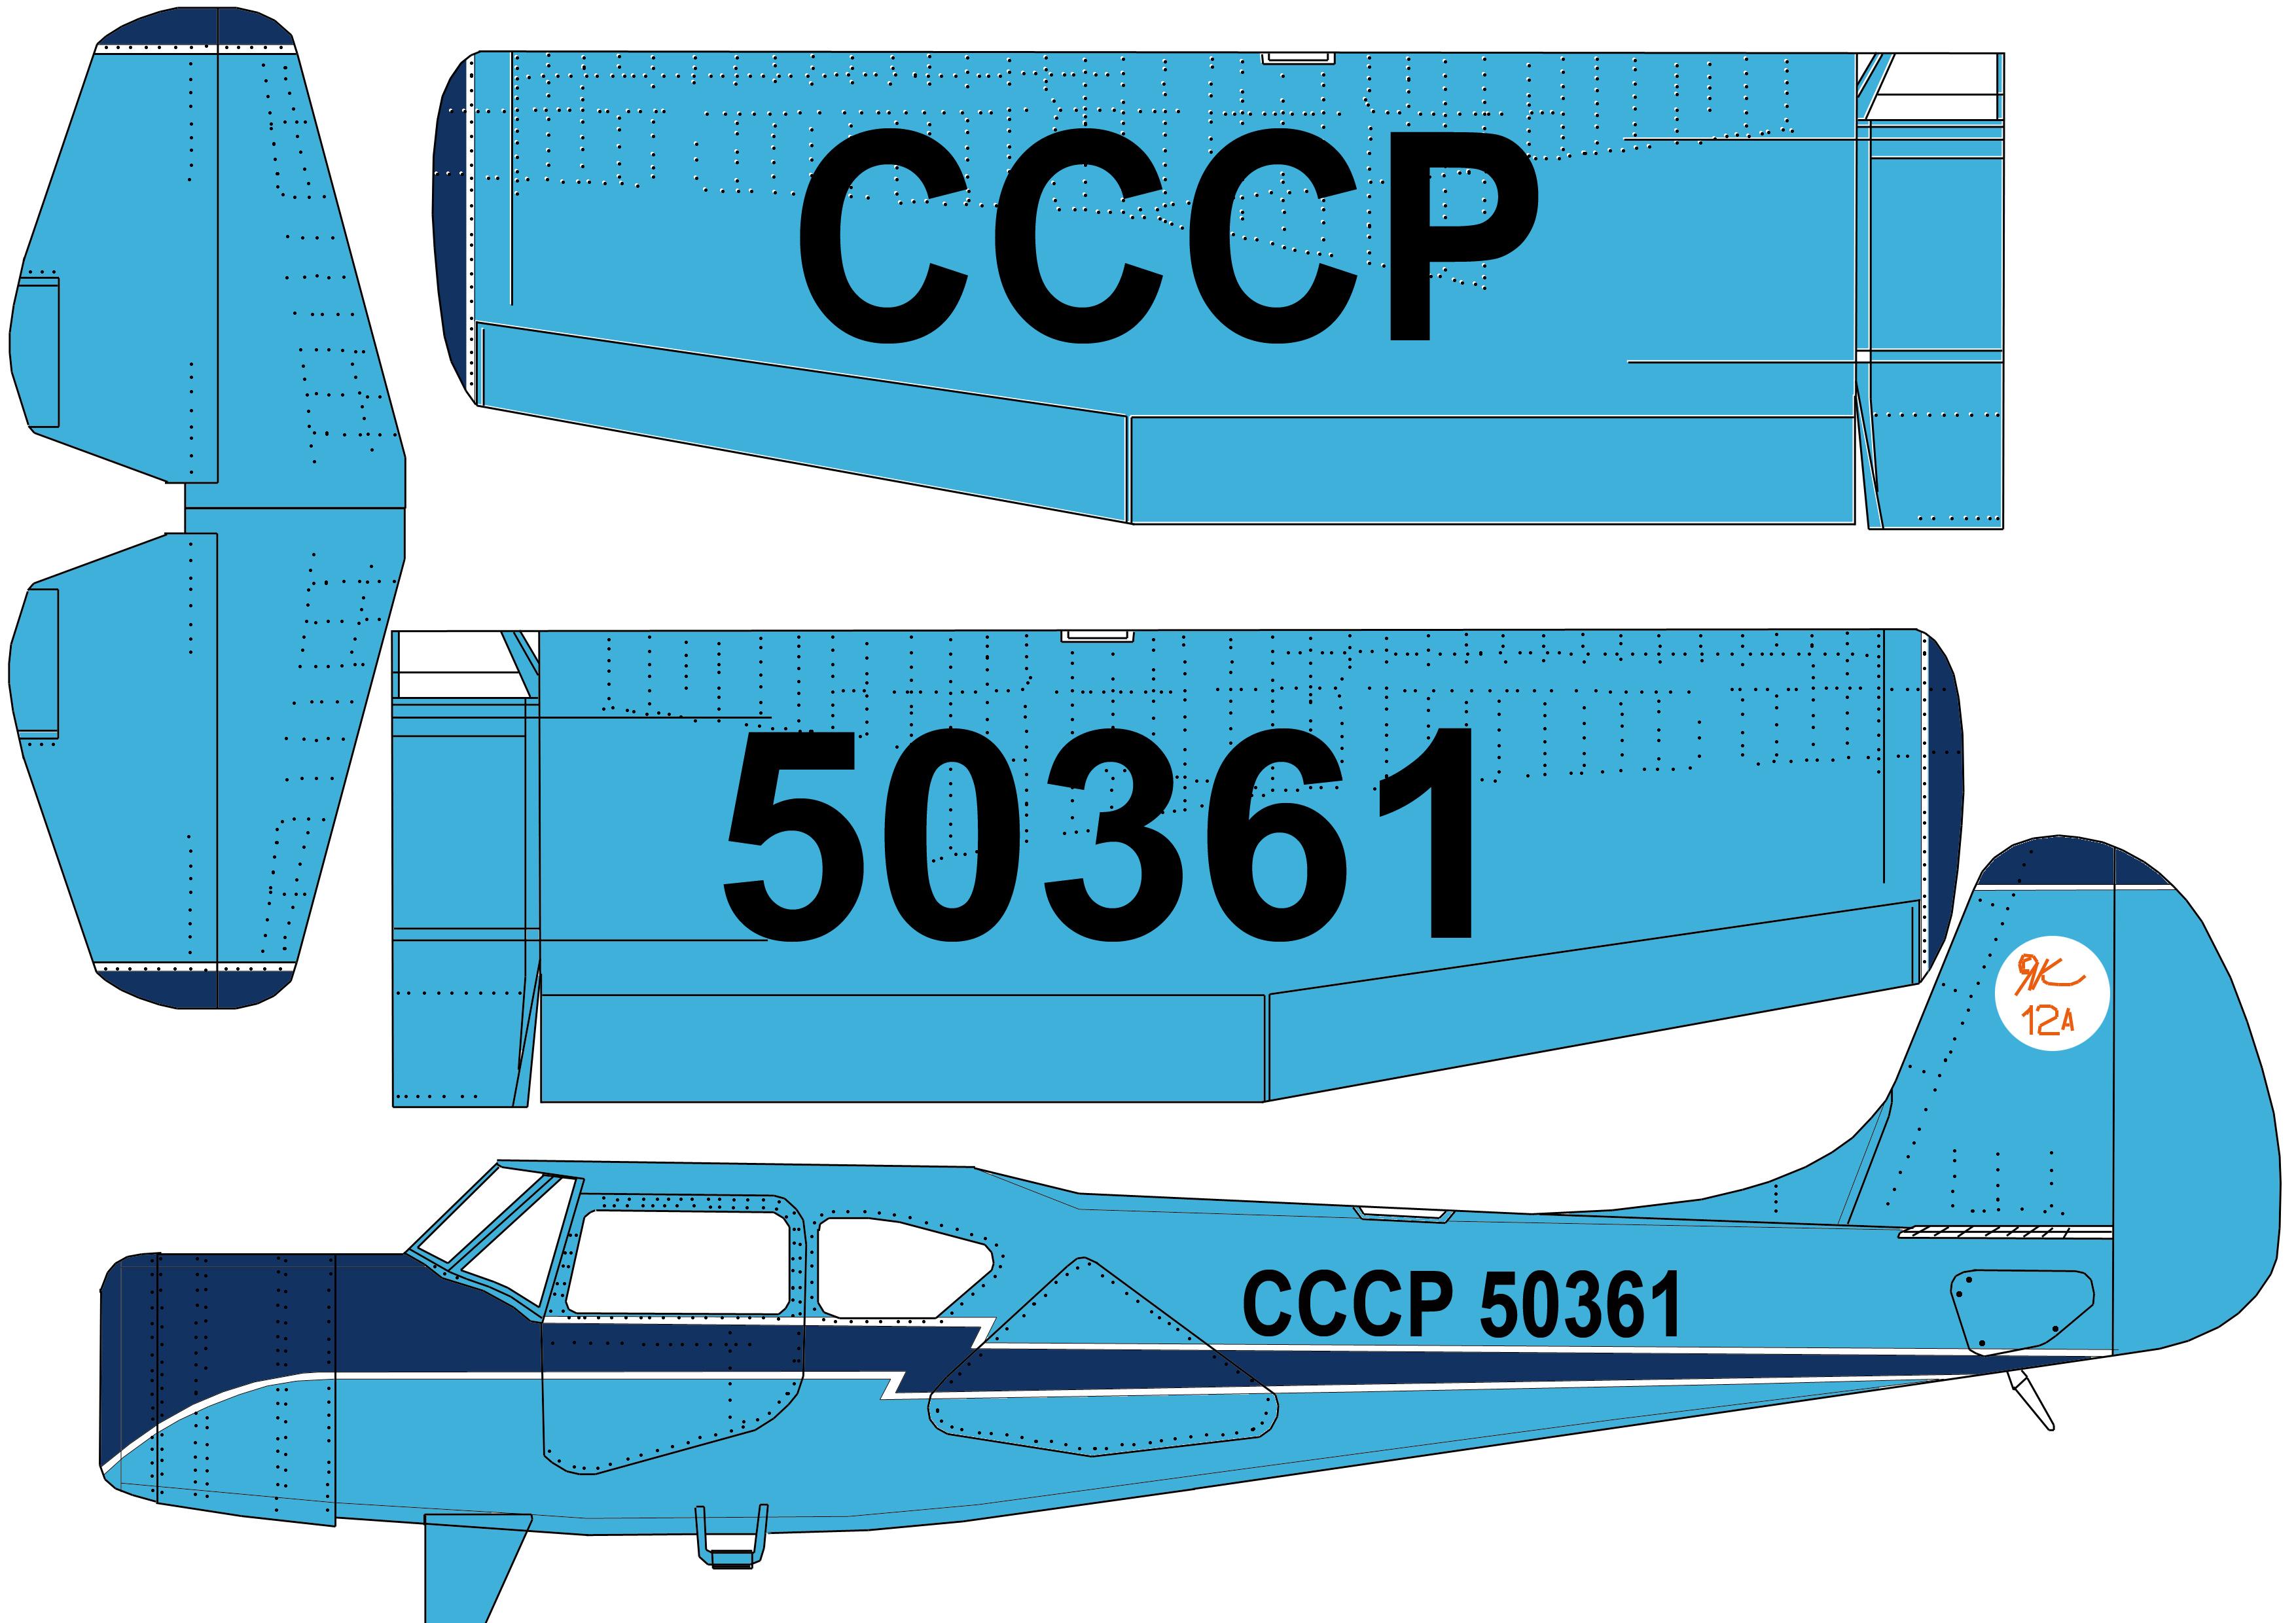 Макет самолёта из пенопласта своими руками 60